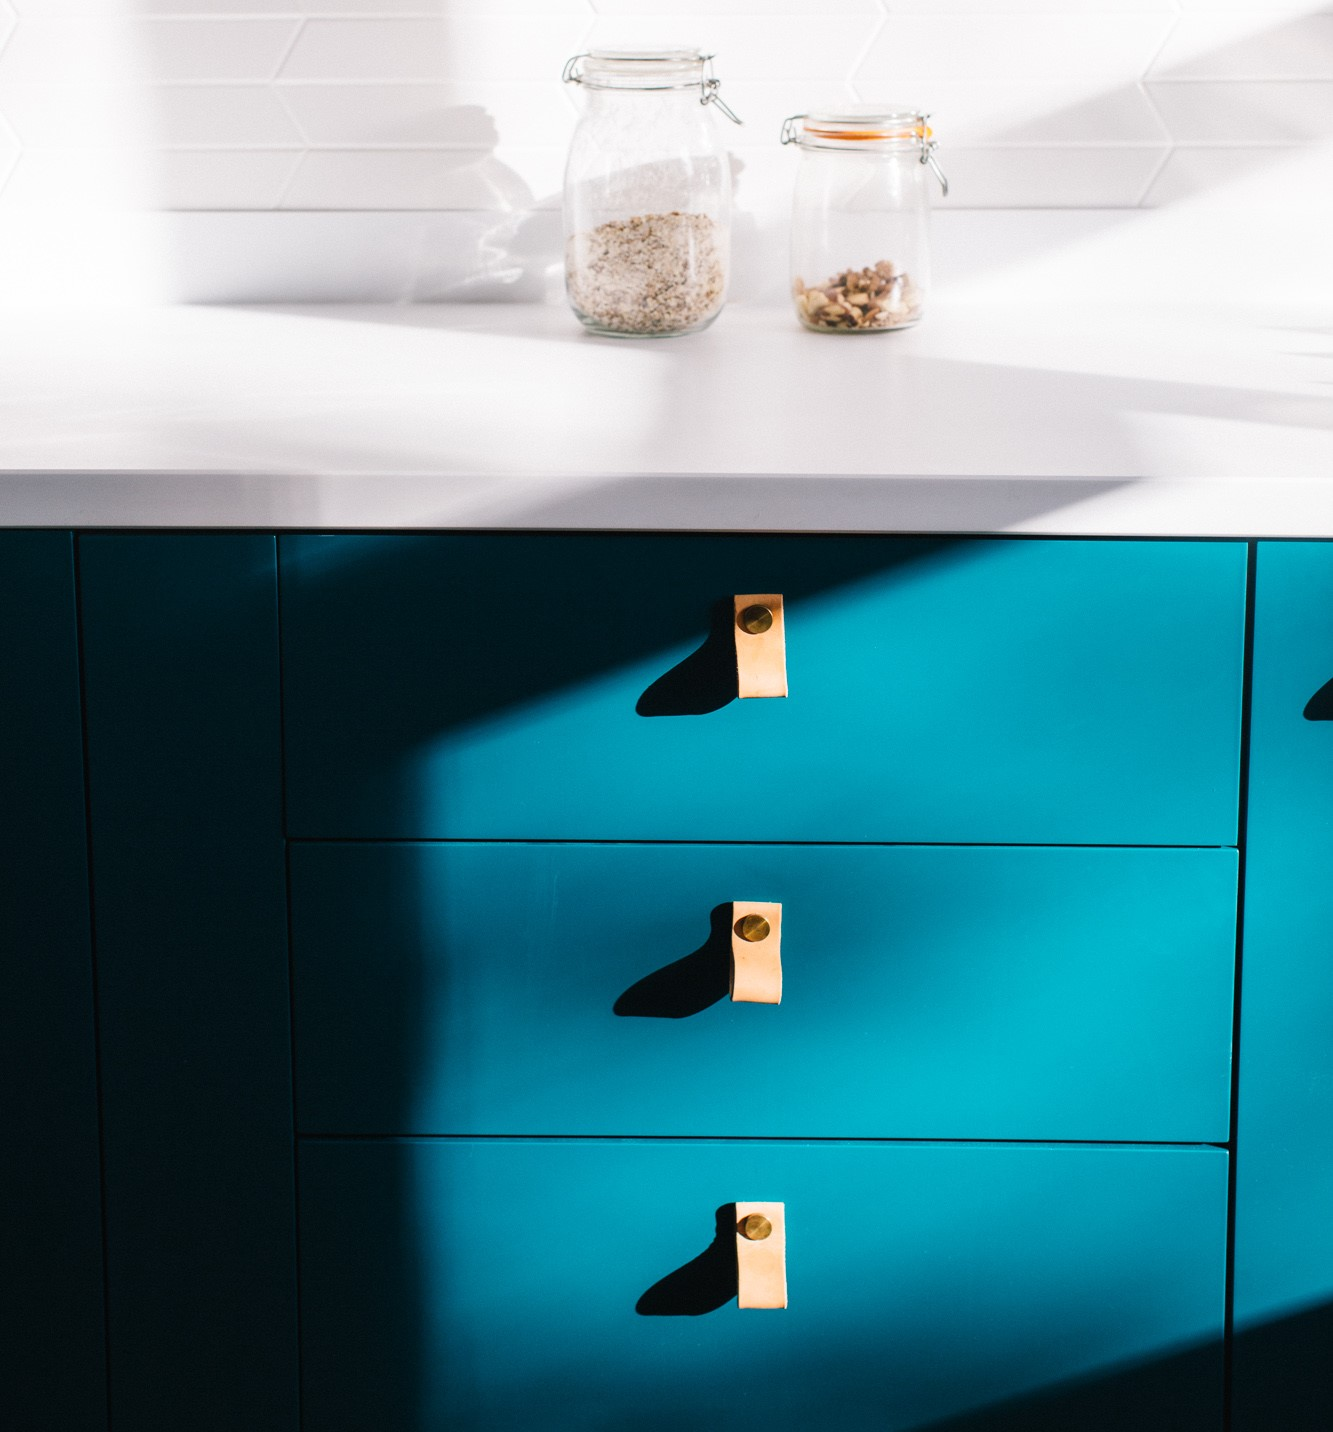 Bespoke Shaker Doors Upgrades For IKEA Kitchens.